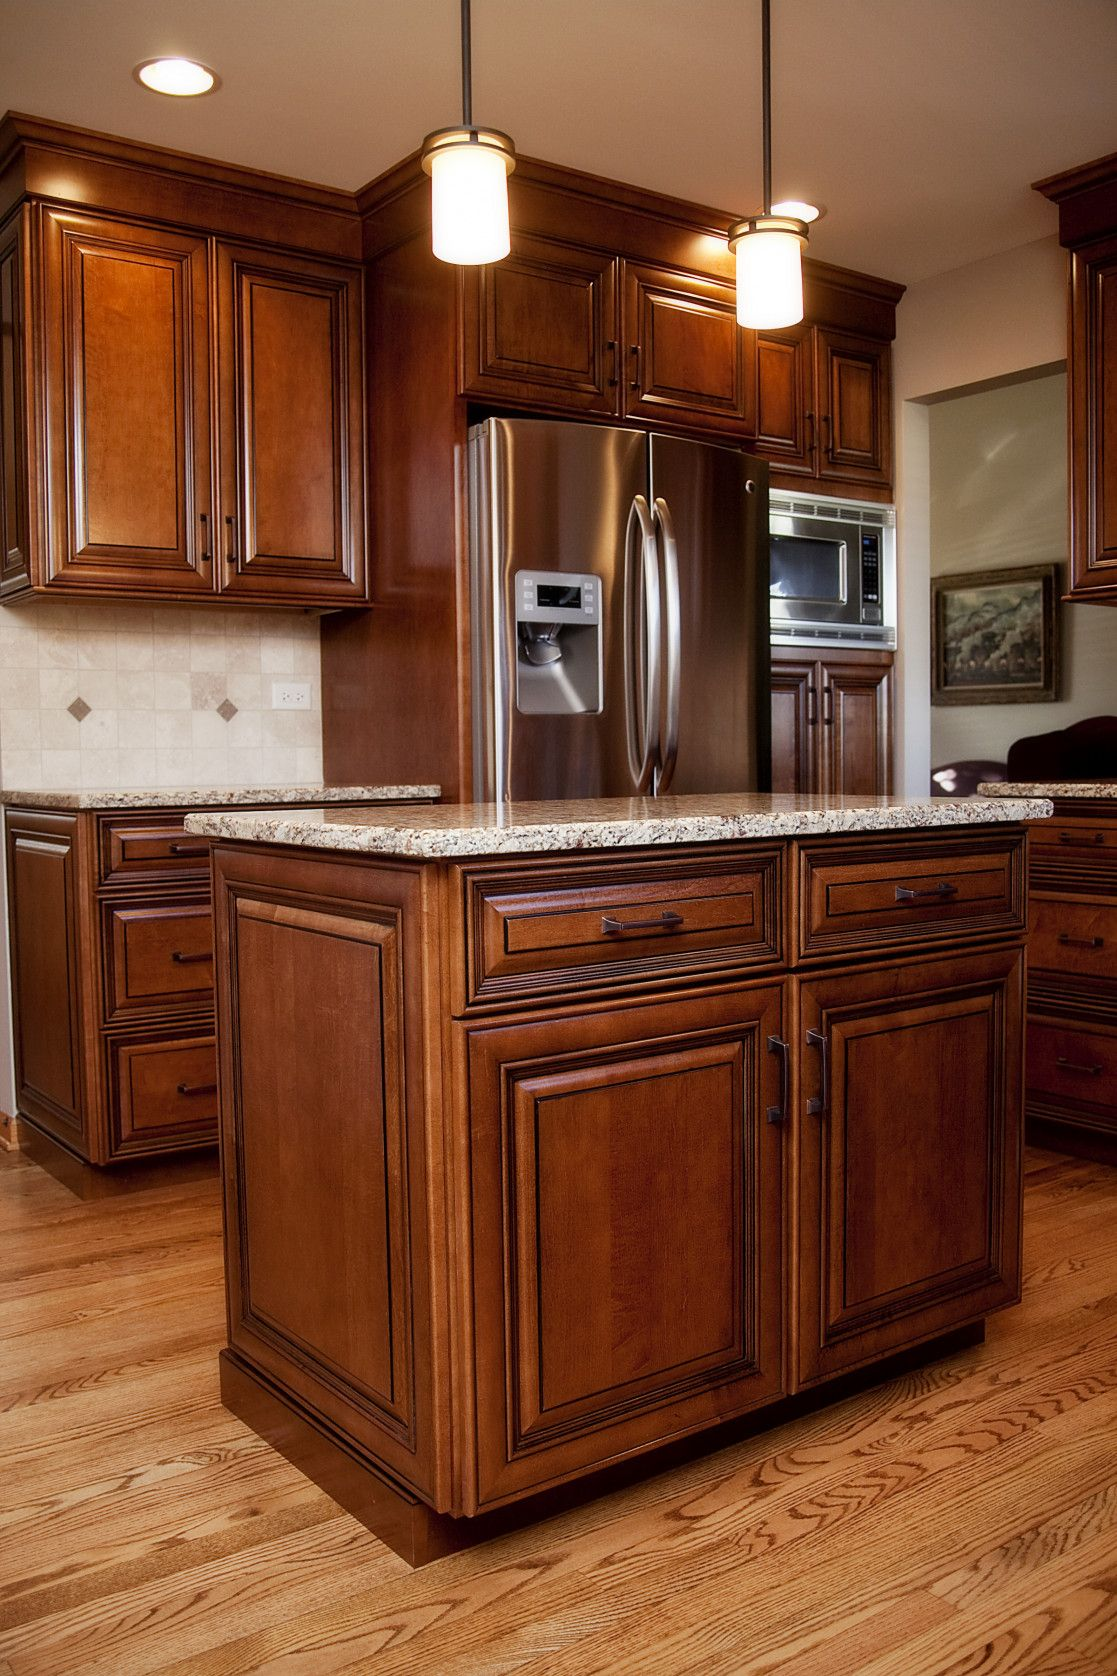 99+ Glazed Maple Kitchen Cabinets - Kitchen Cabinets ...